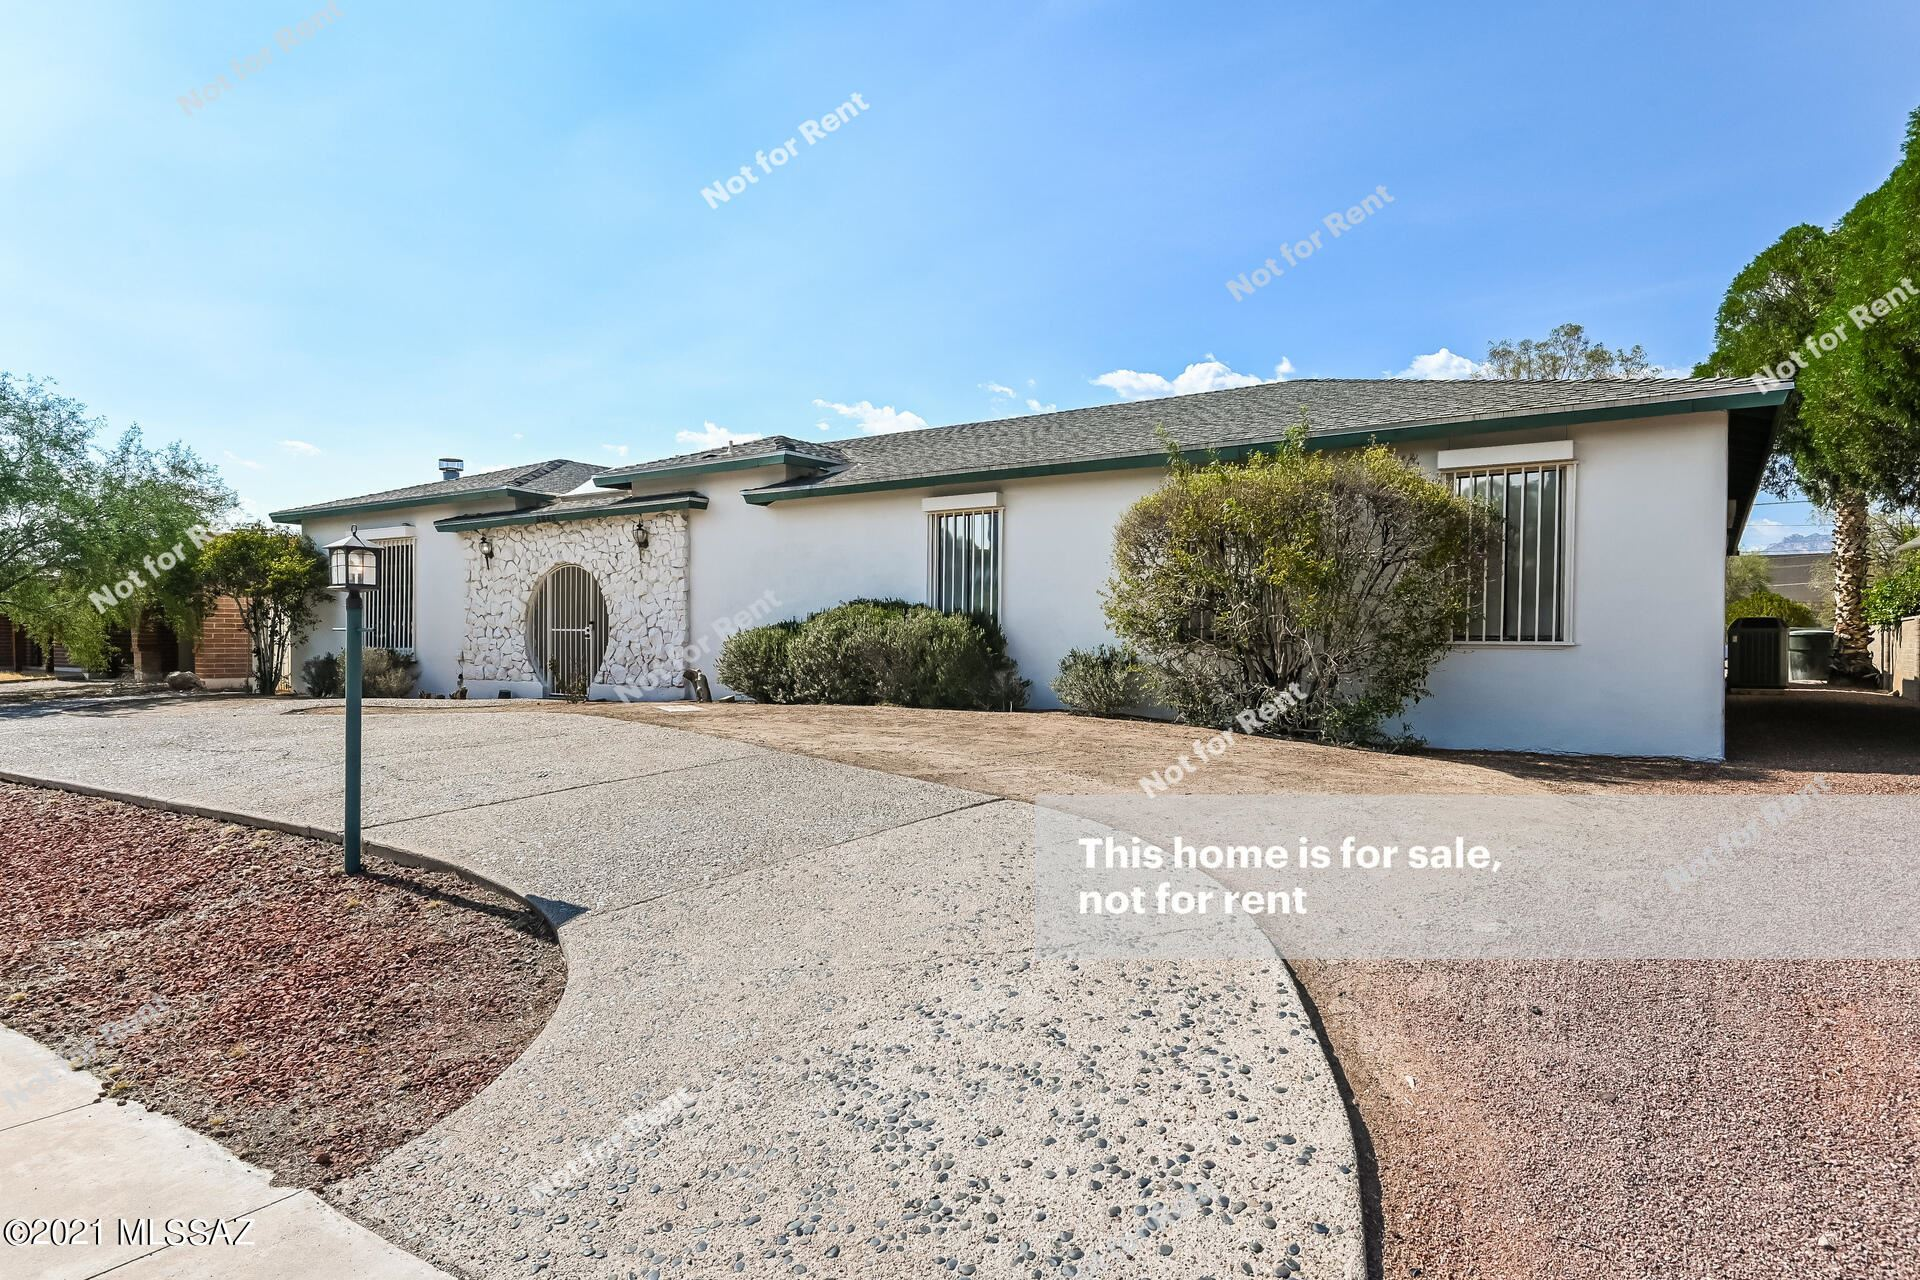 5845 E 15Th Street, Tucson, AZ 85711 - MLS#: 22117749